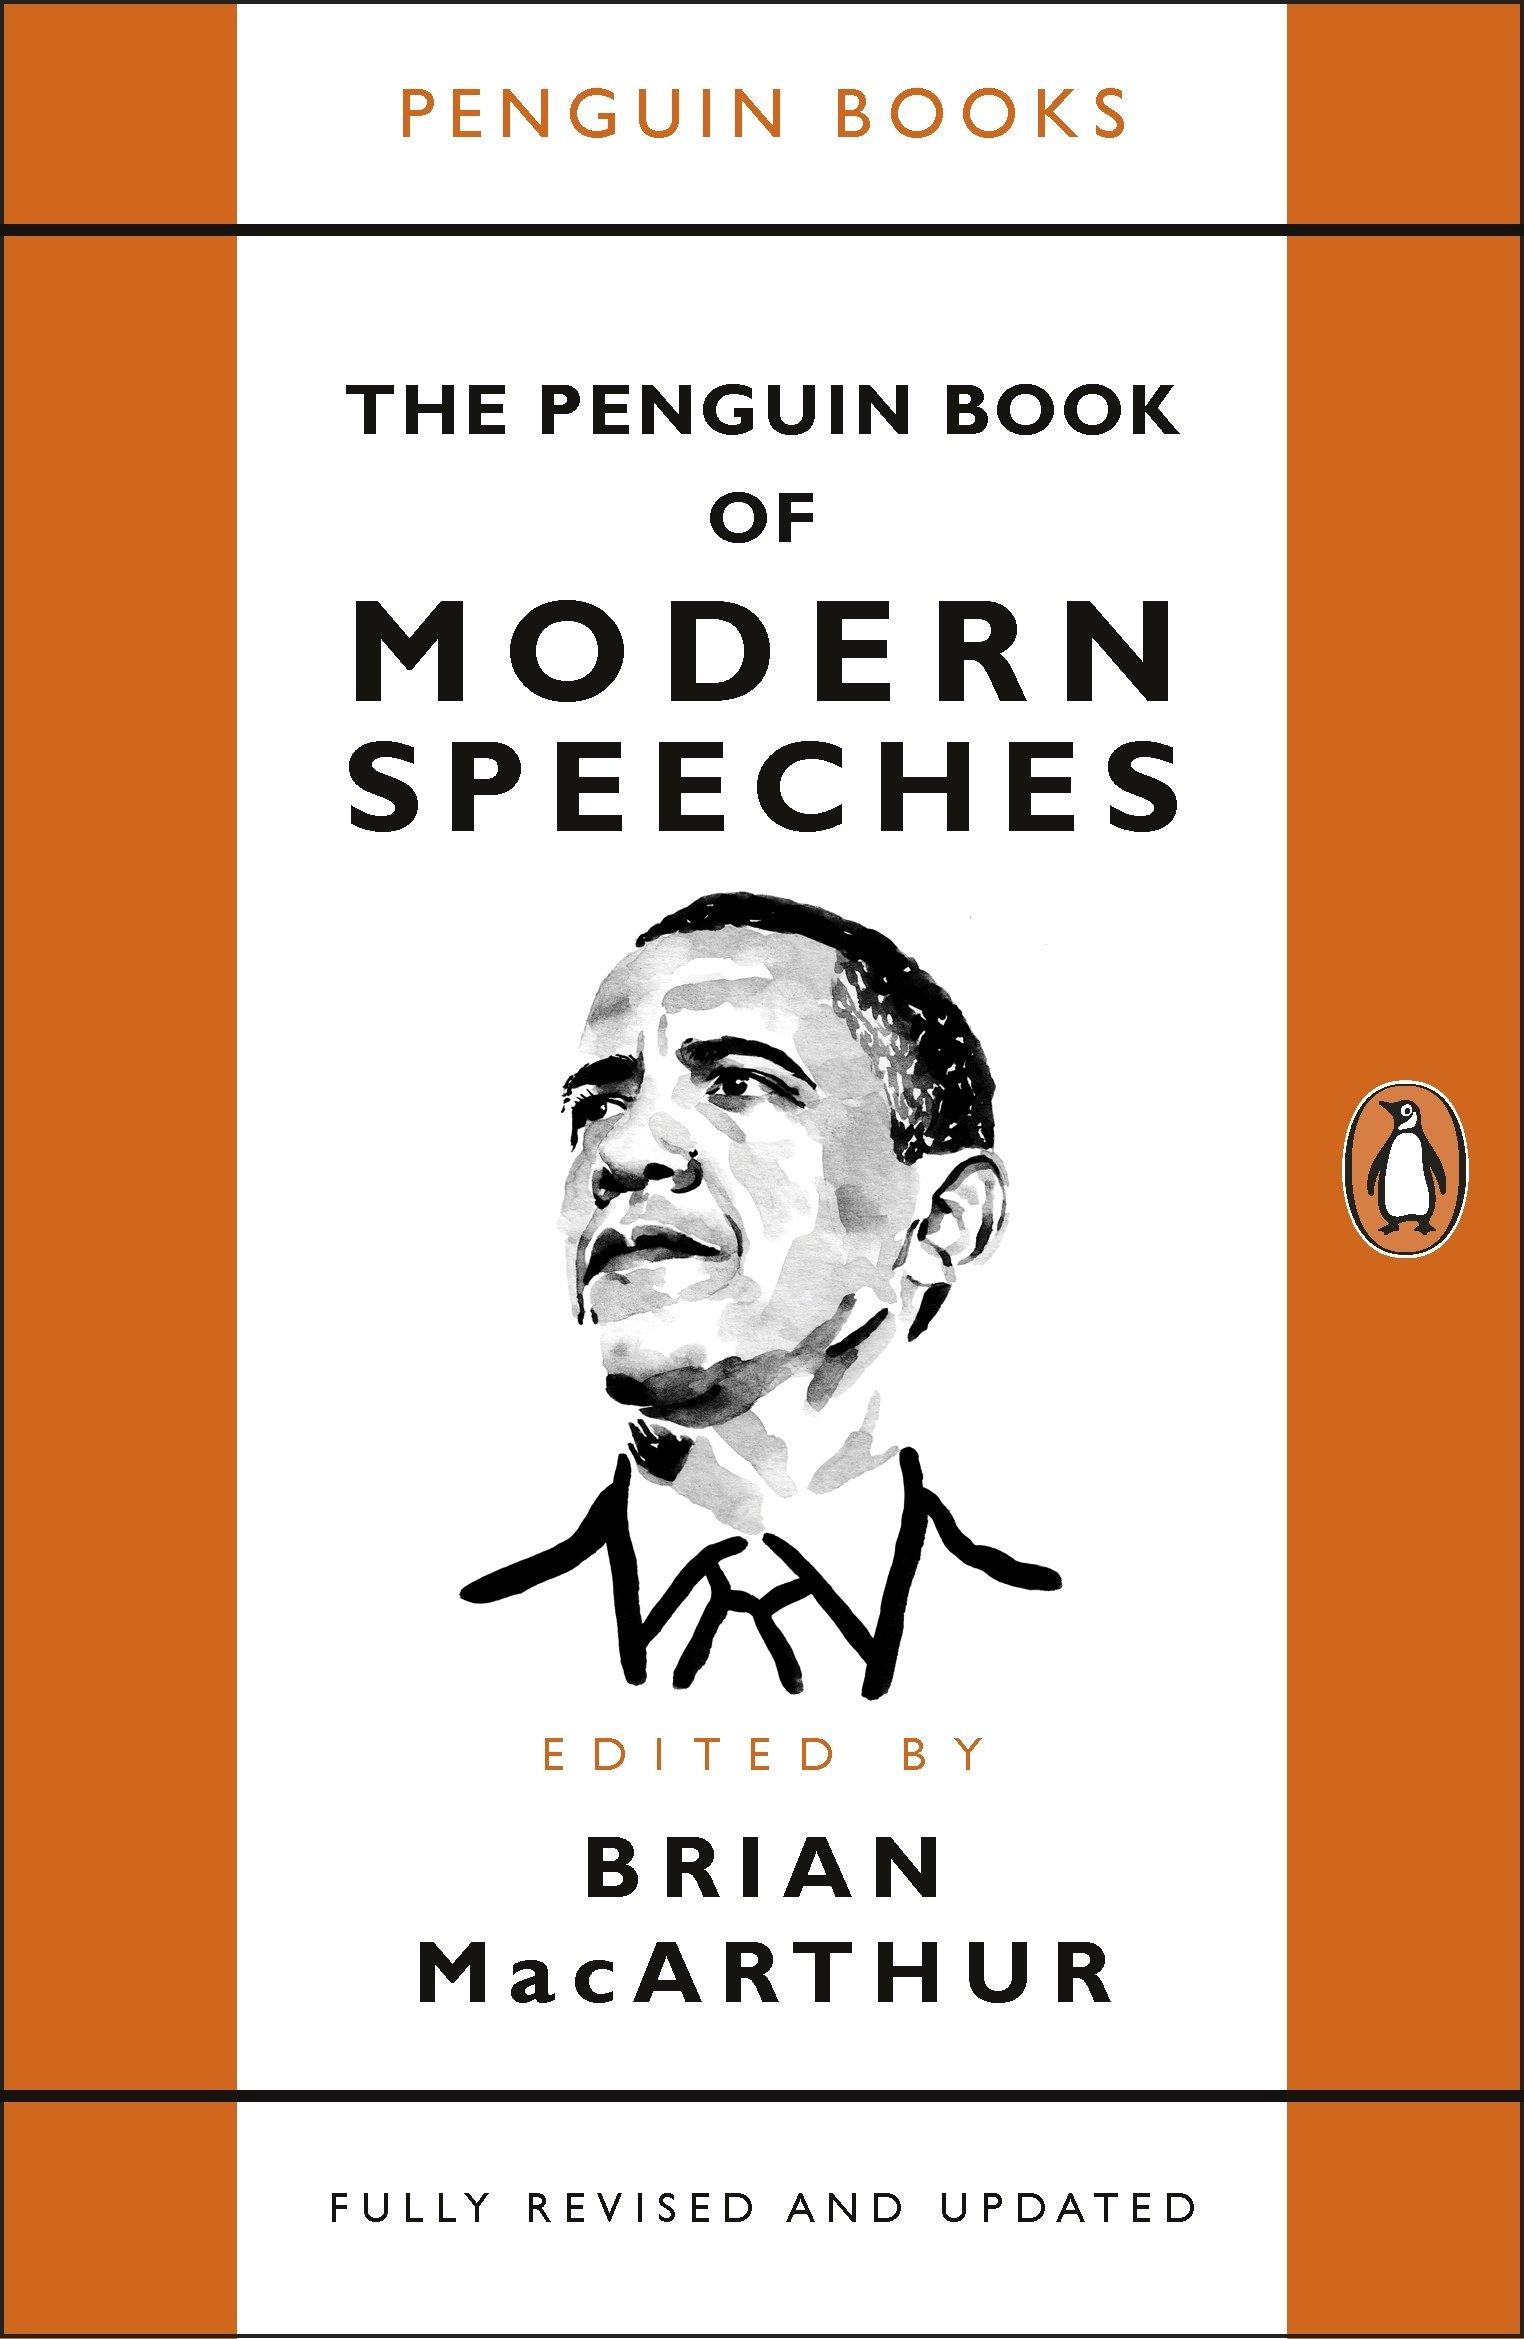 The Penguin Book of Modern Speeches Paperback – 5 Oct 2017